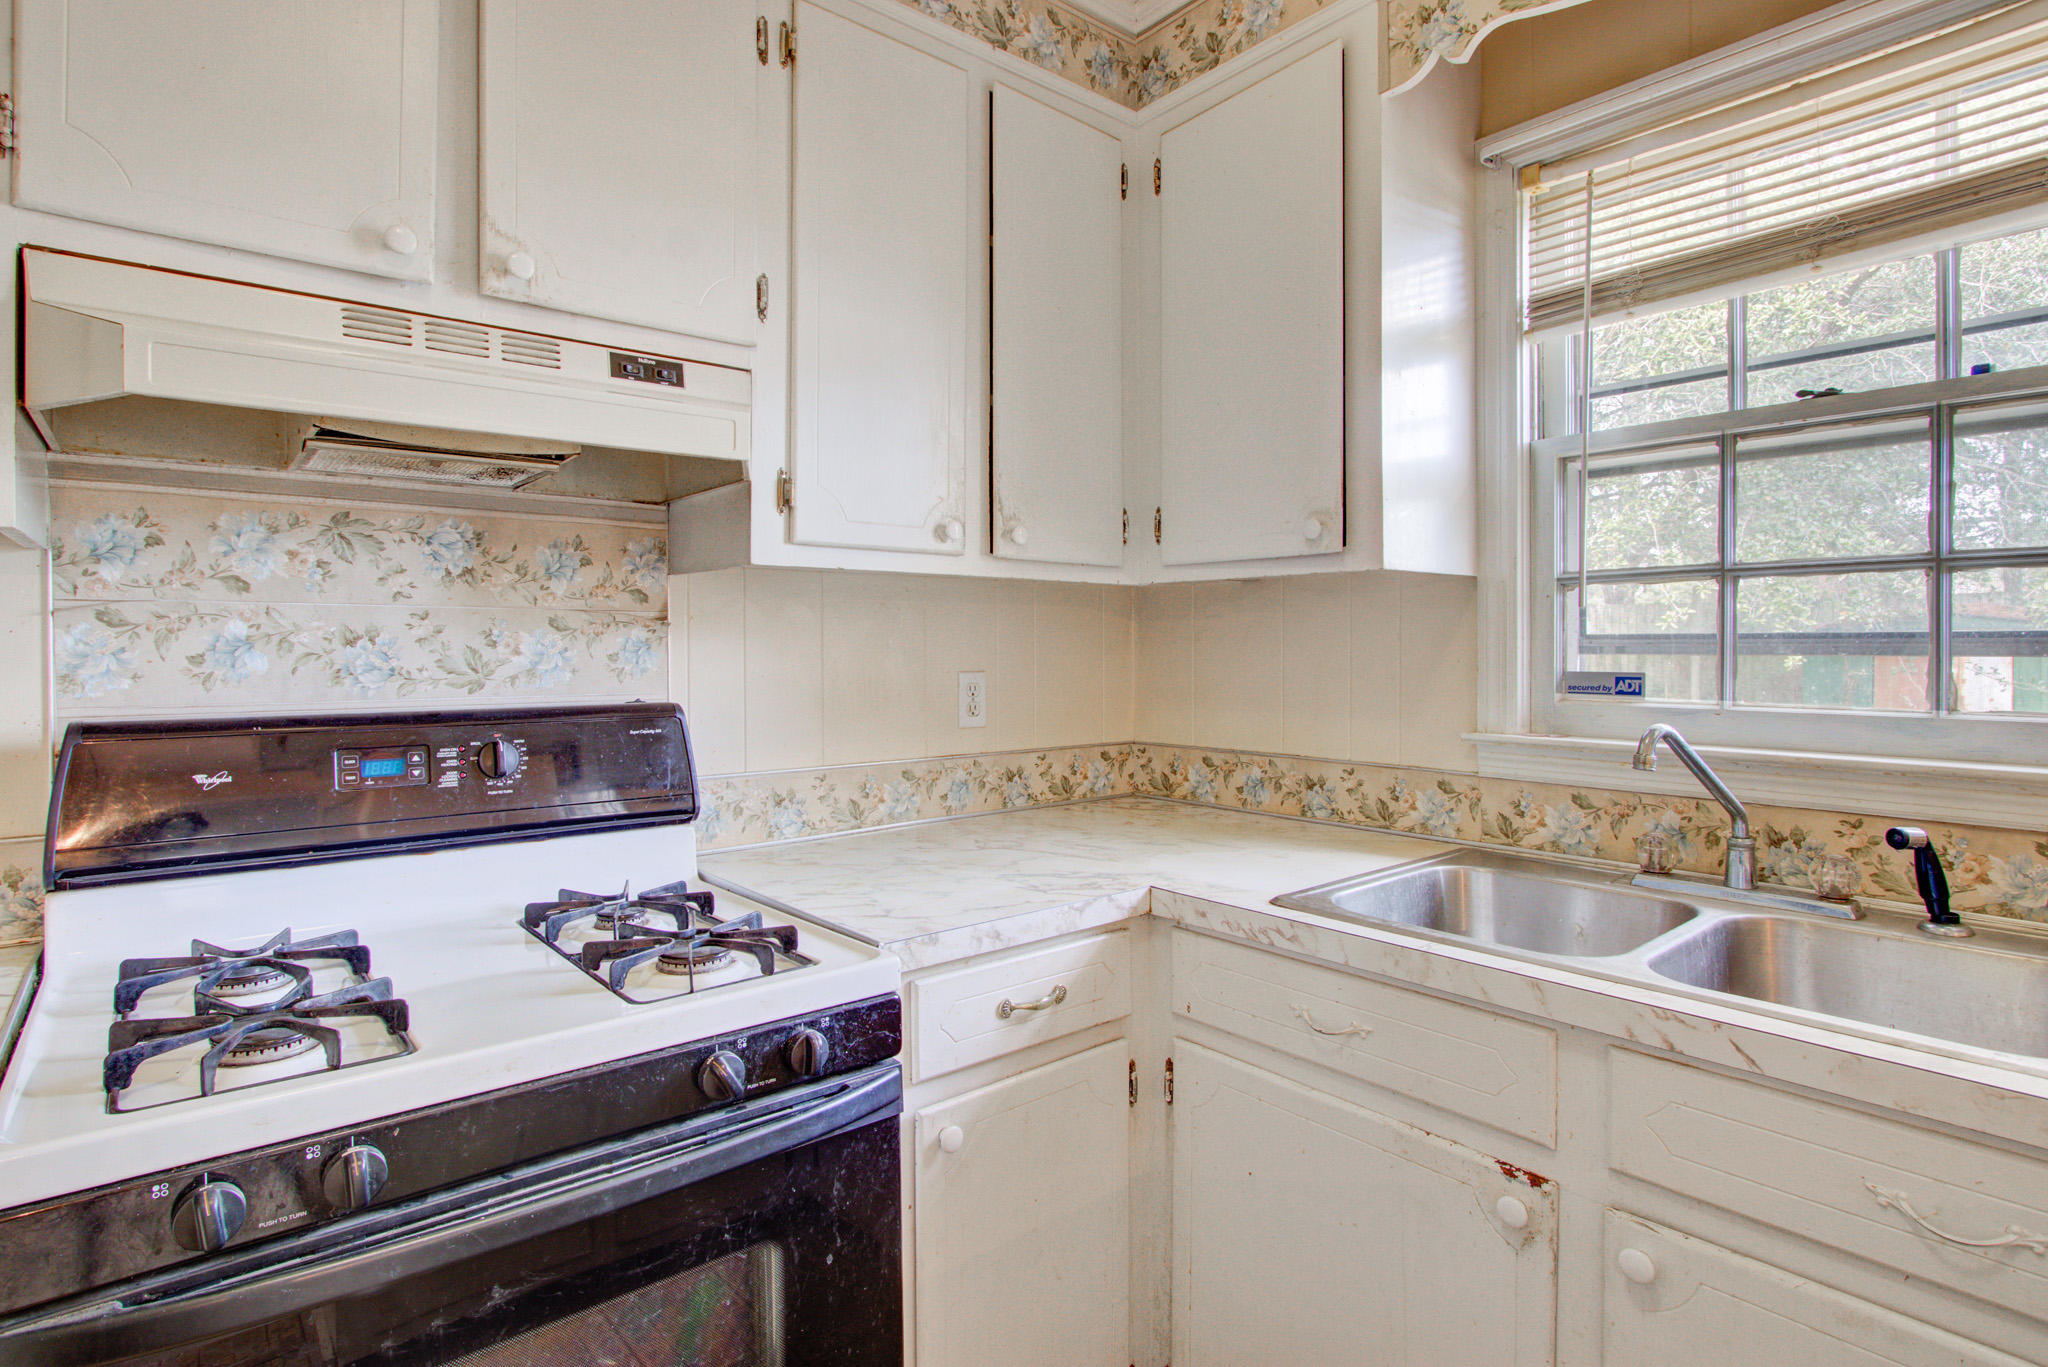 Bushy Park Terrace Homes For Sale - 125 Azalea, Goose Creek, SC - 16